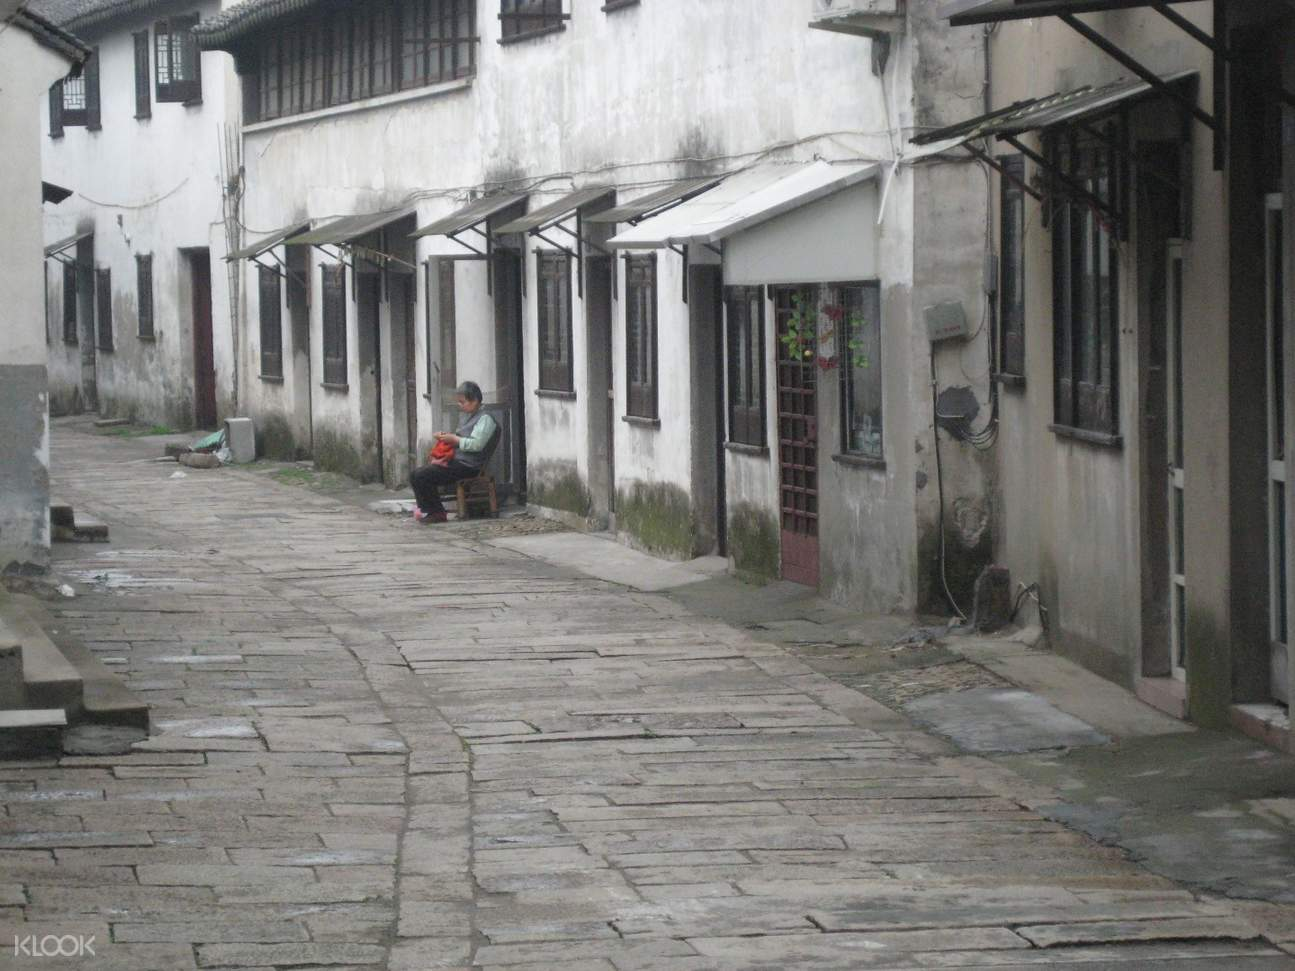 suzhou water town admission ticket